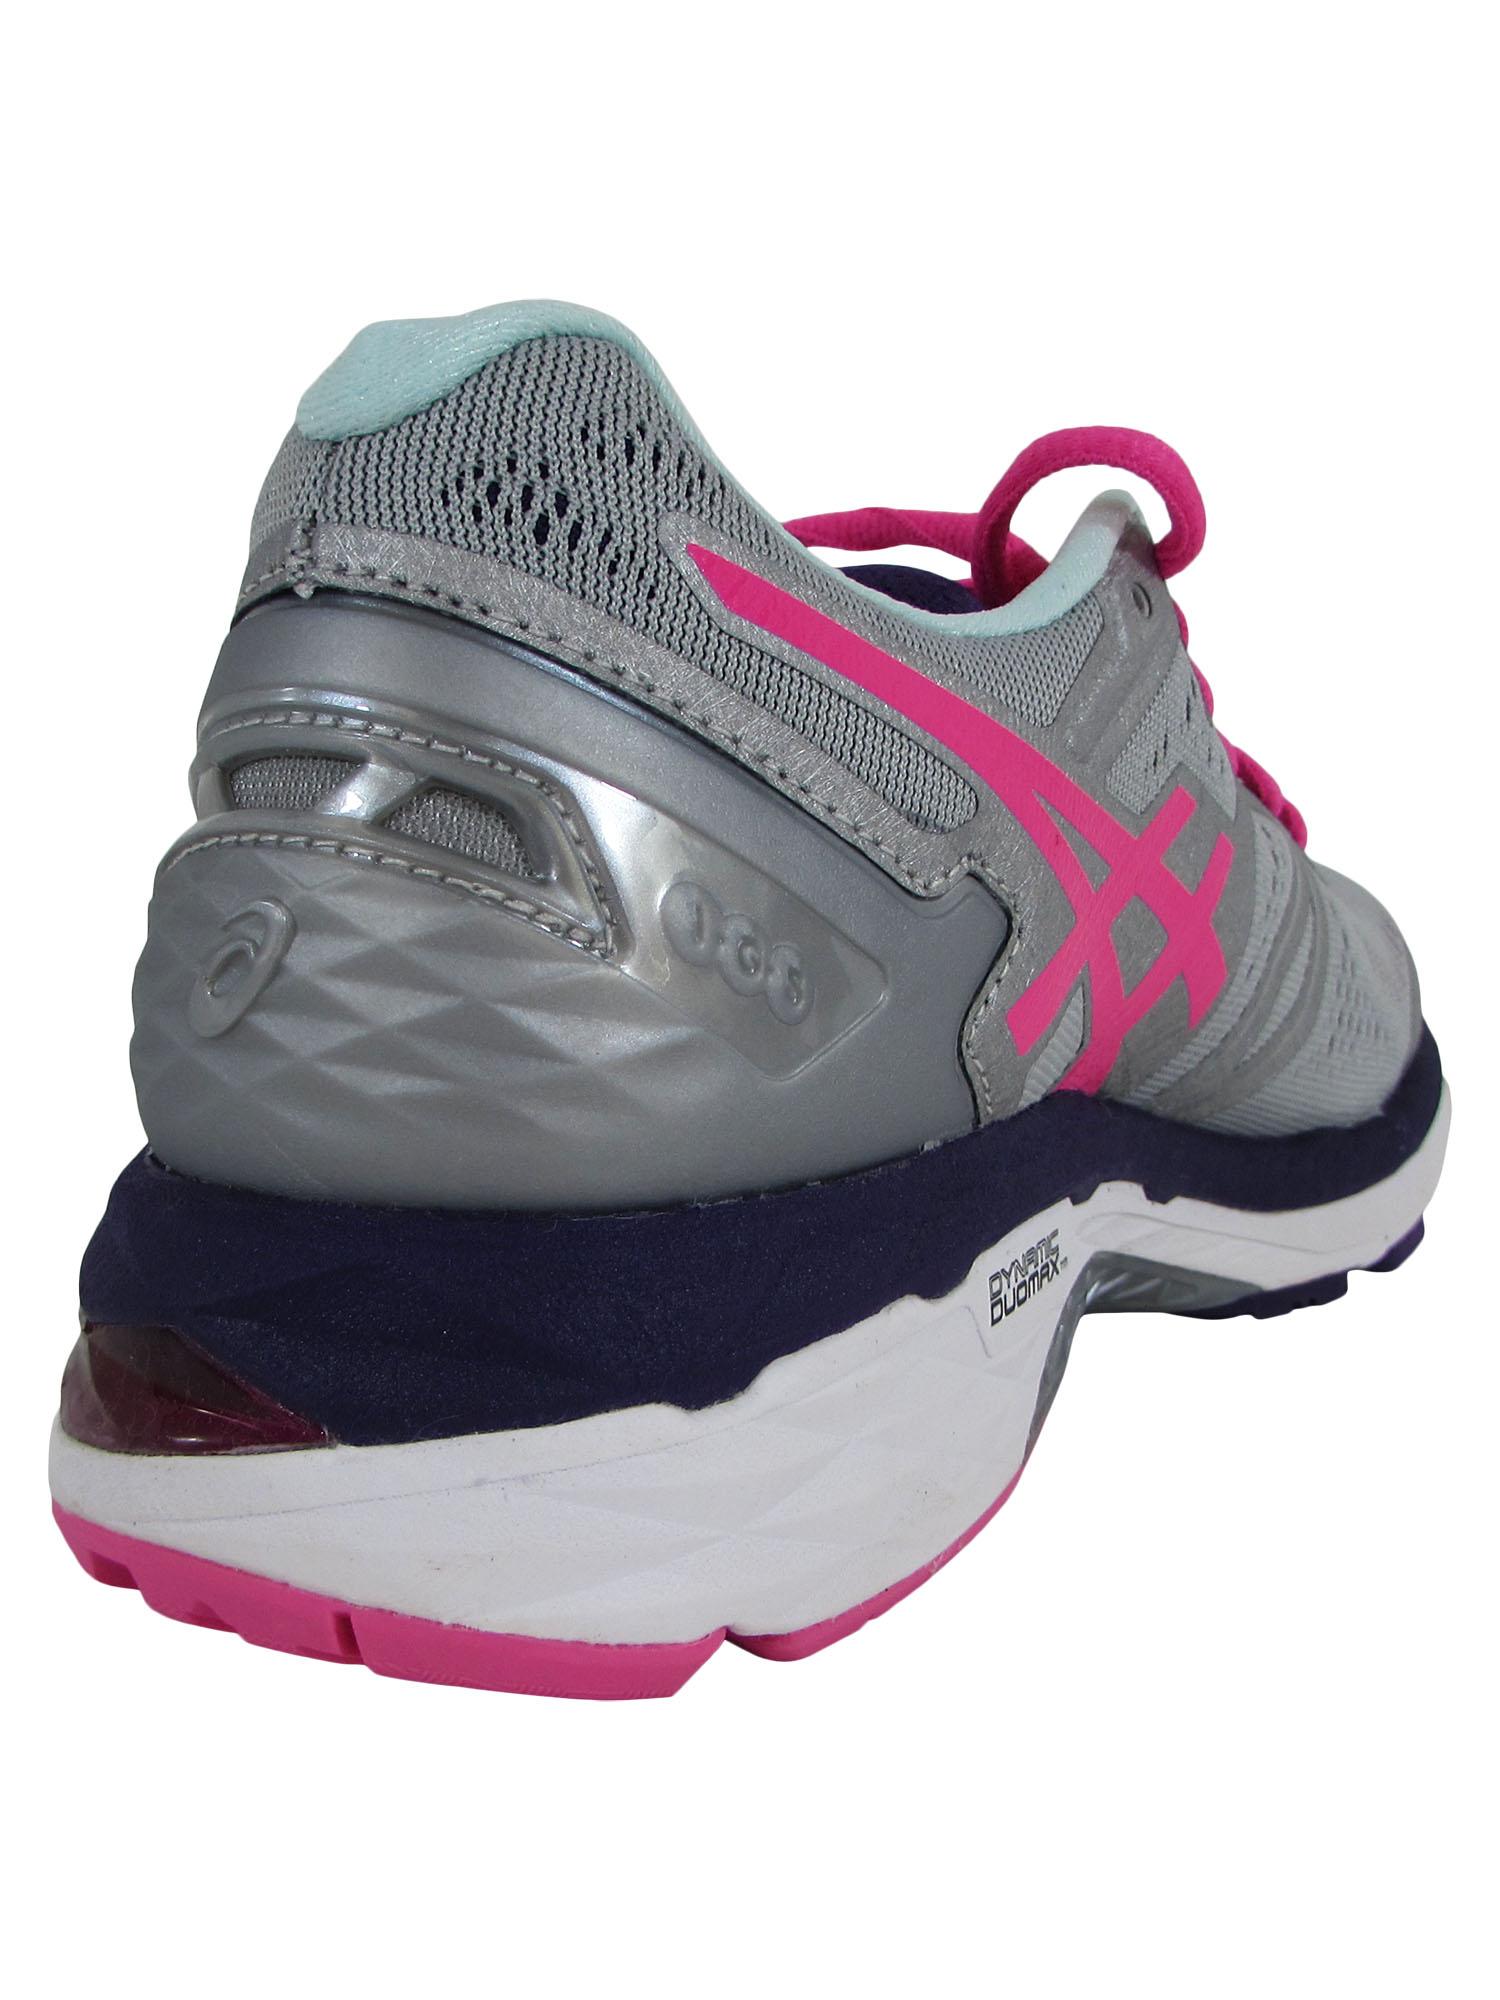 d7a8de118f02 Buy ASICS GEL Kayano 23 Running Wide Women s Shoes Size 6 online